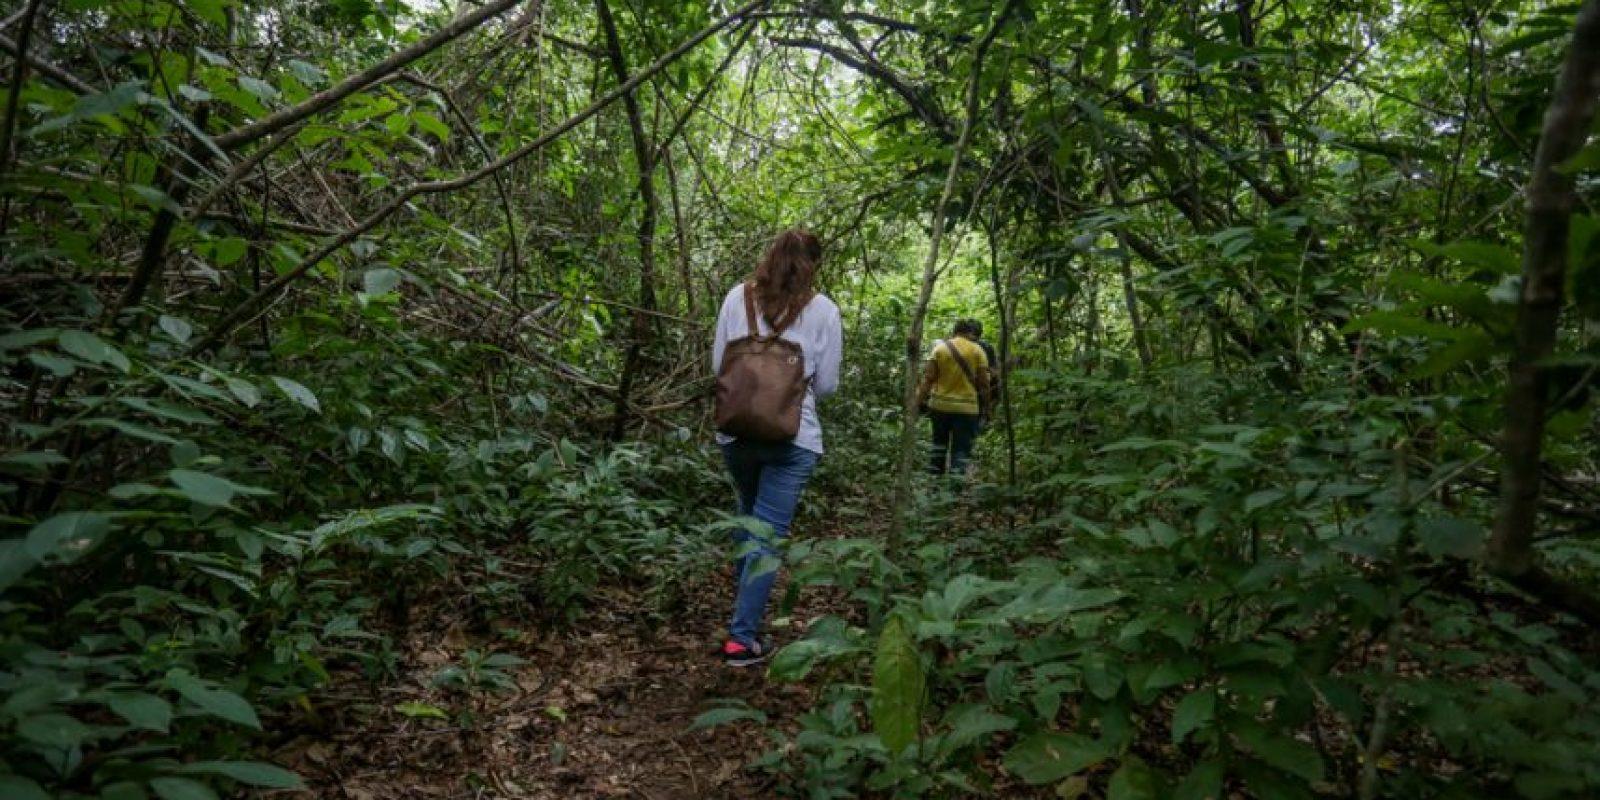 Camino del bosque seco tropical Foto:César Nigrinis Name